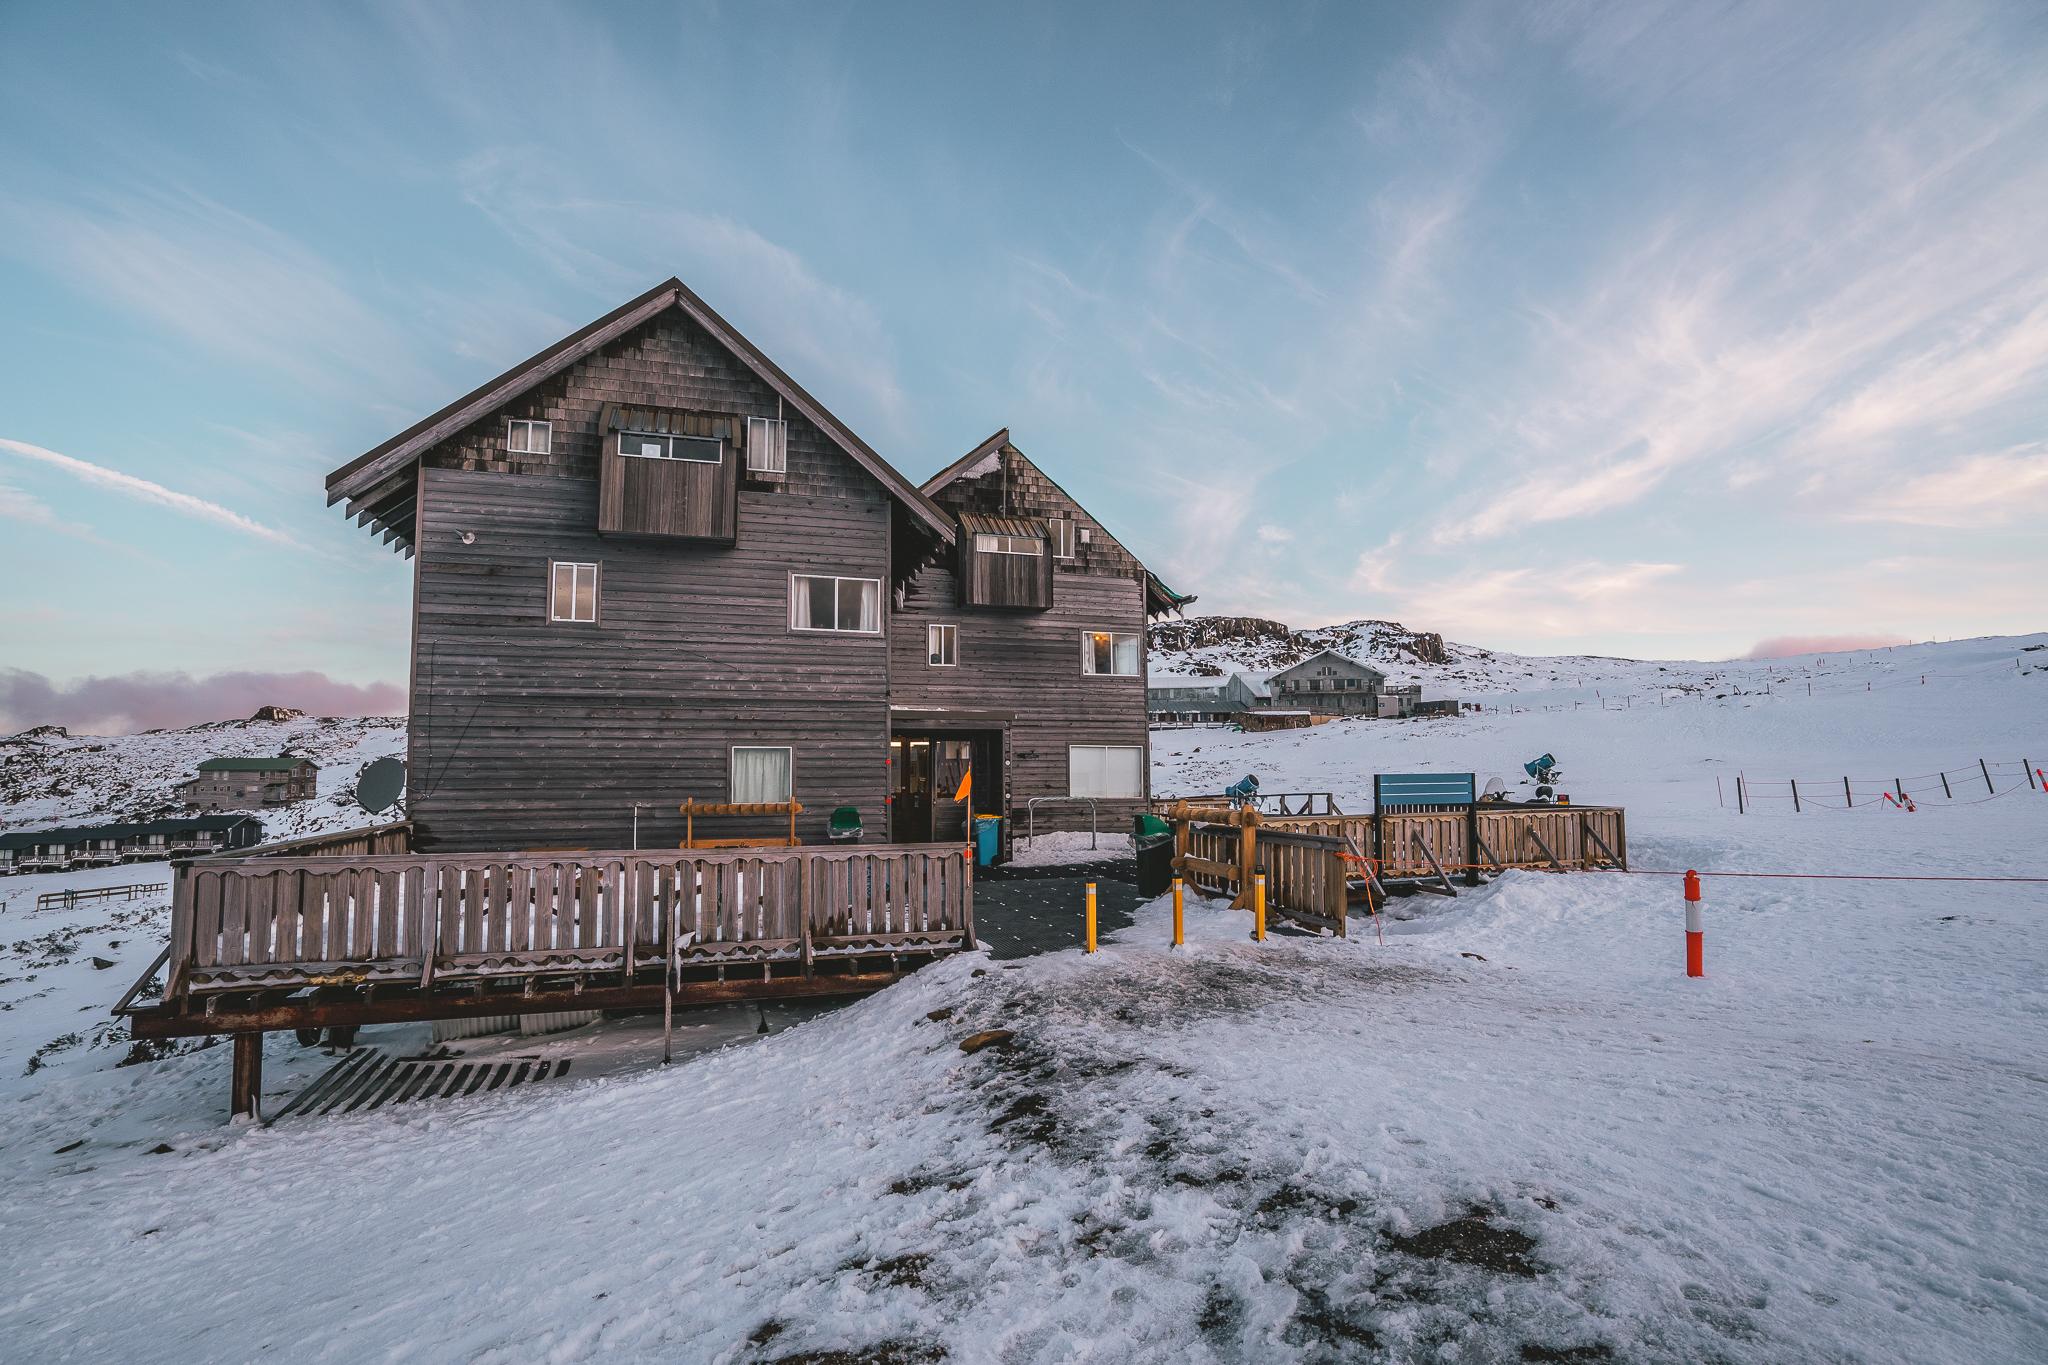 Ski, snowboard, and toboggan hire in this building. Ben Lomond Snow Sports.